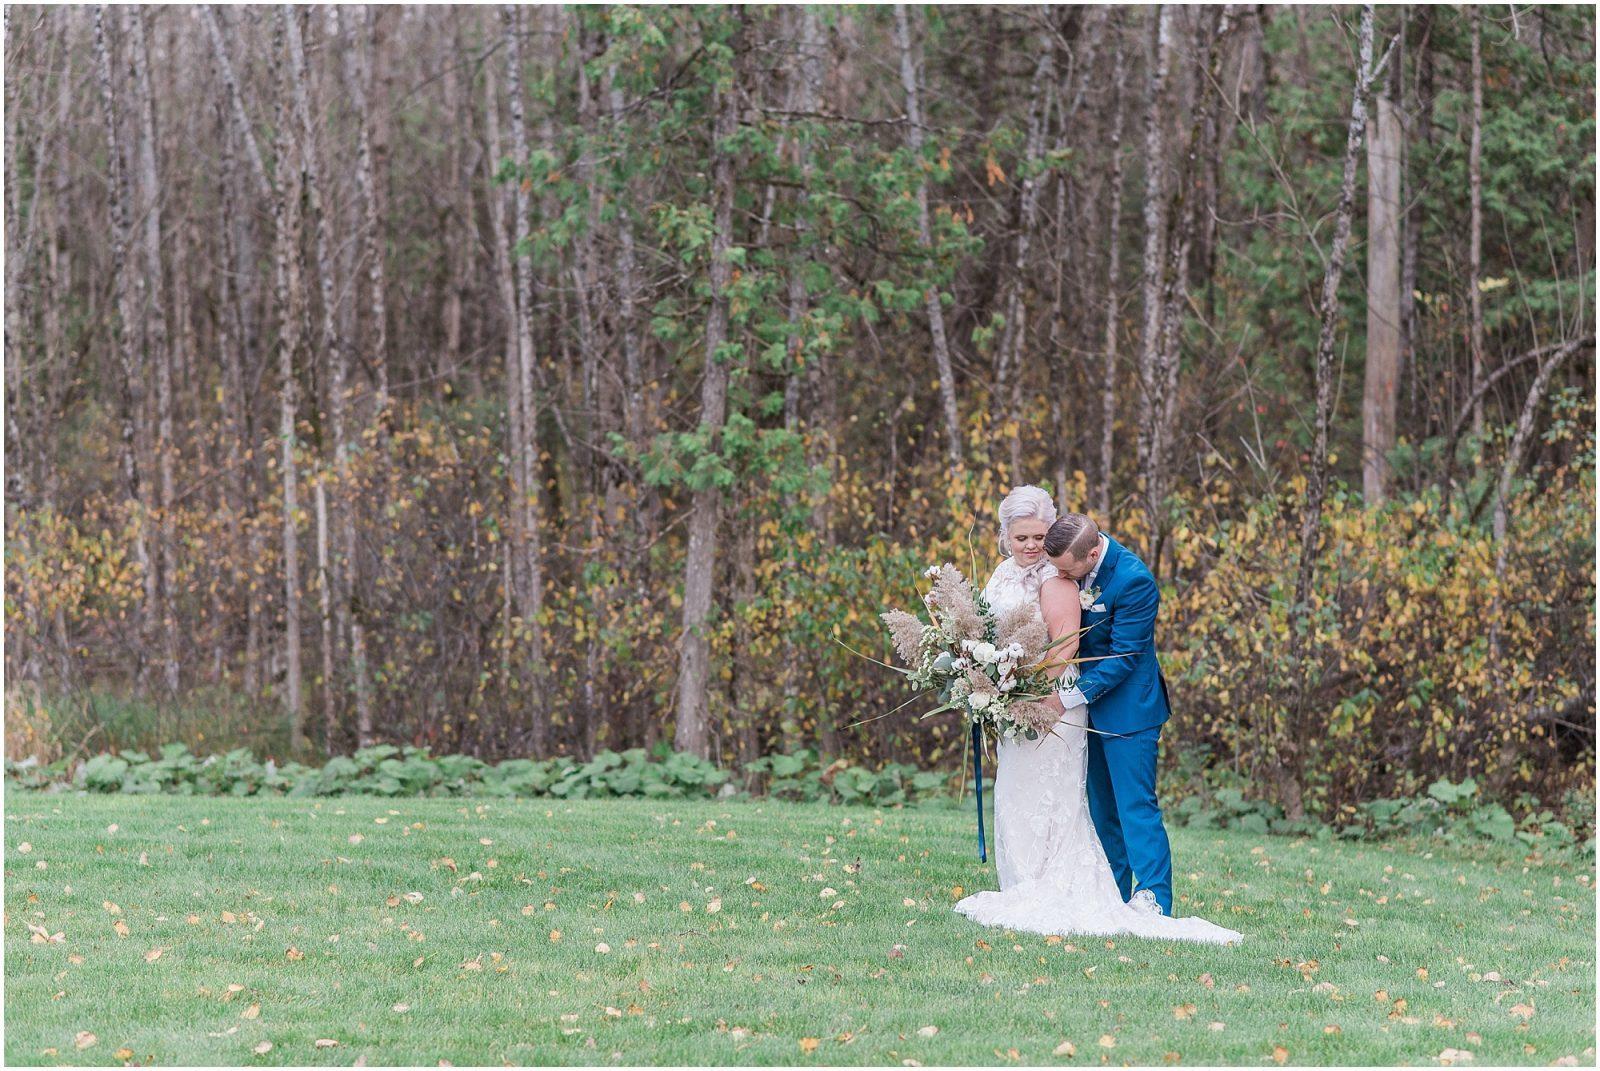 0050 Bethany and Luc - Fall Backyard Ottawa Wedding - Copper and Navy - PhotosbyEmmaH.jpg